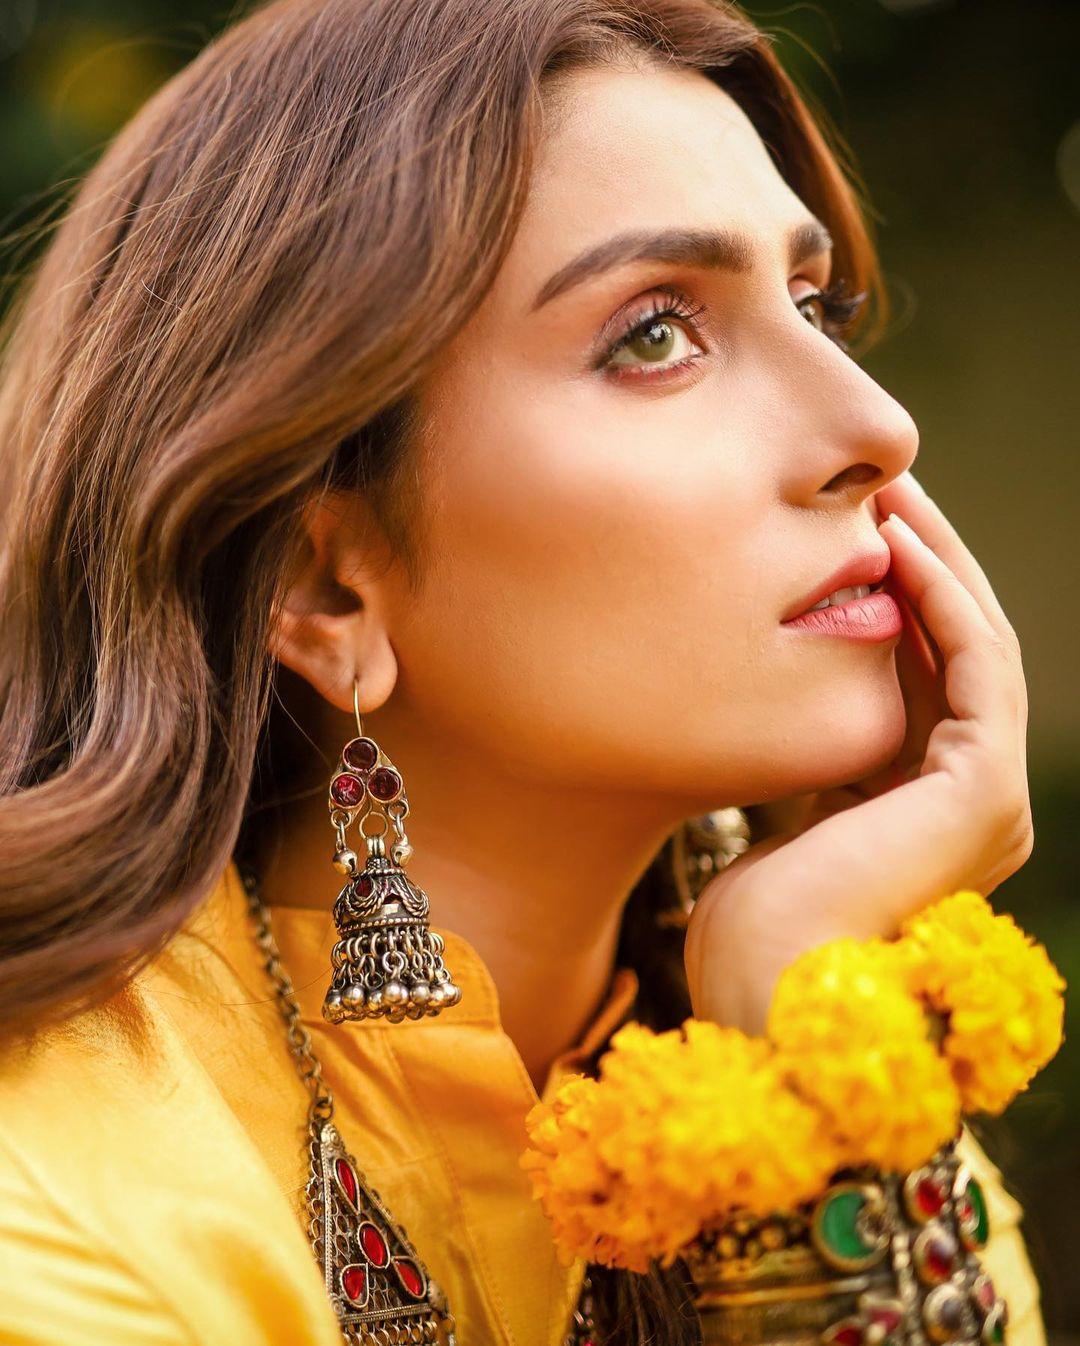 Ayeza Khan Photo Shoot for TJK Designs